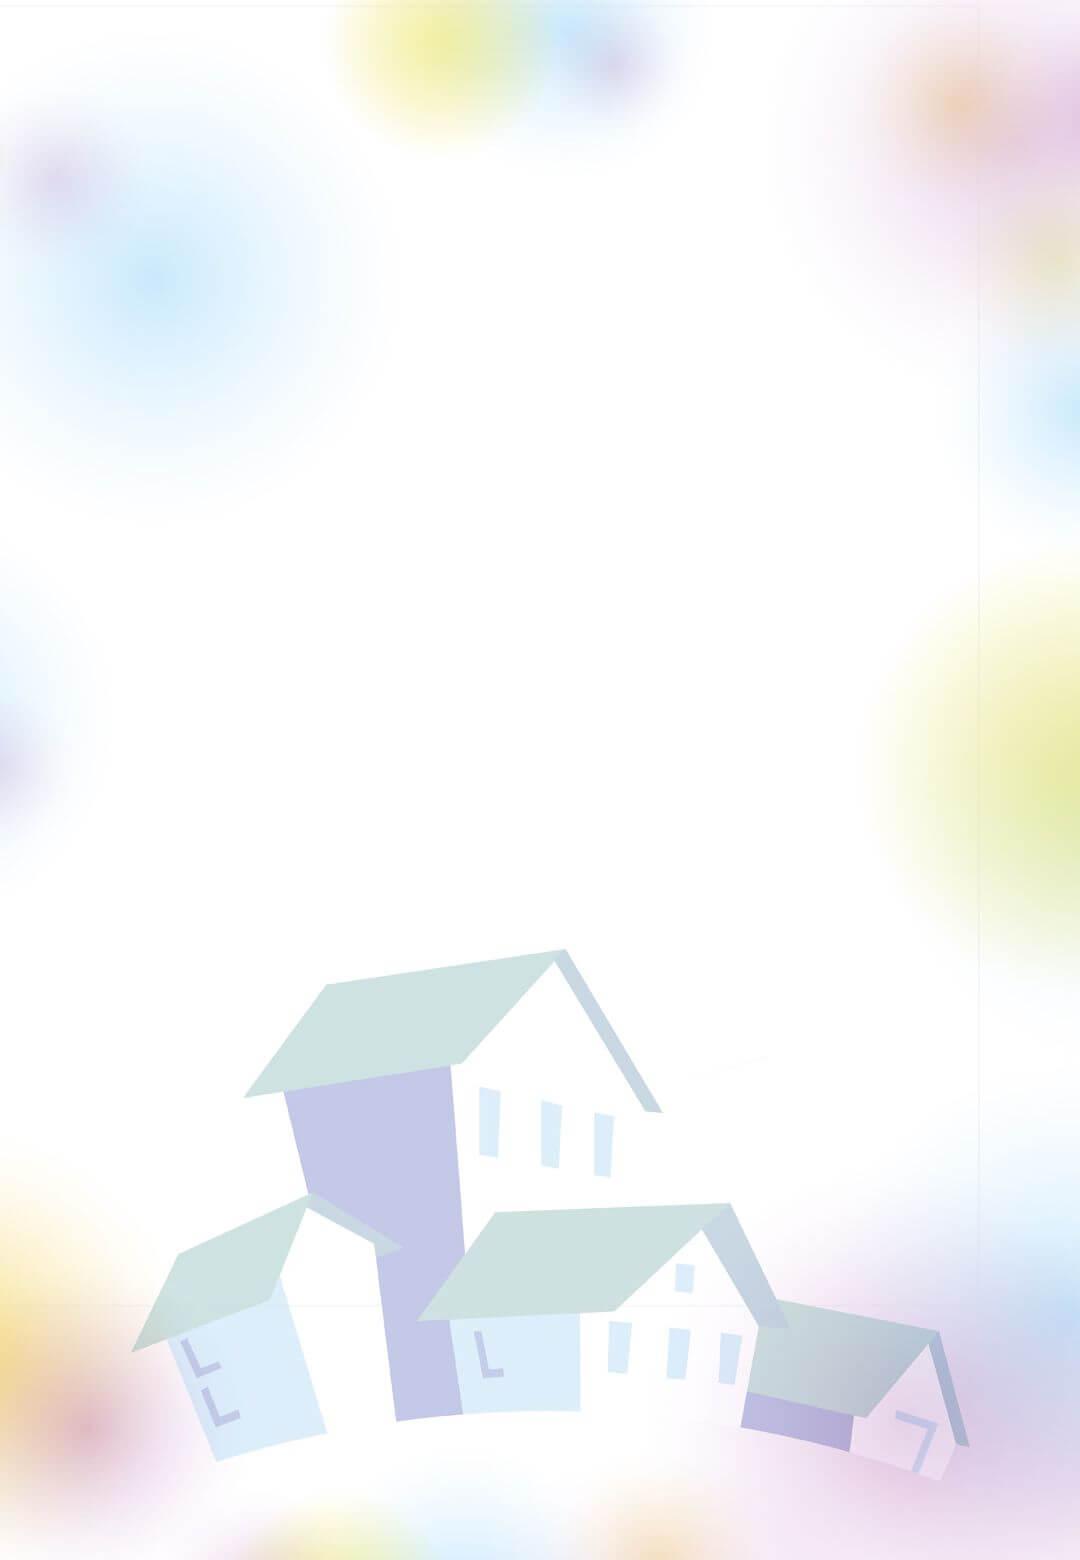 Housewarming Invitation Free Printable | Parties | Holidays Pertaining To Free Housewarming Invitation Card Template